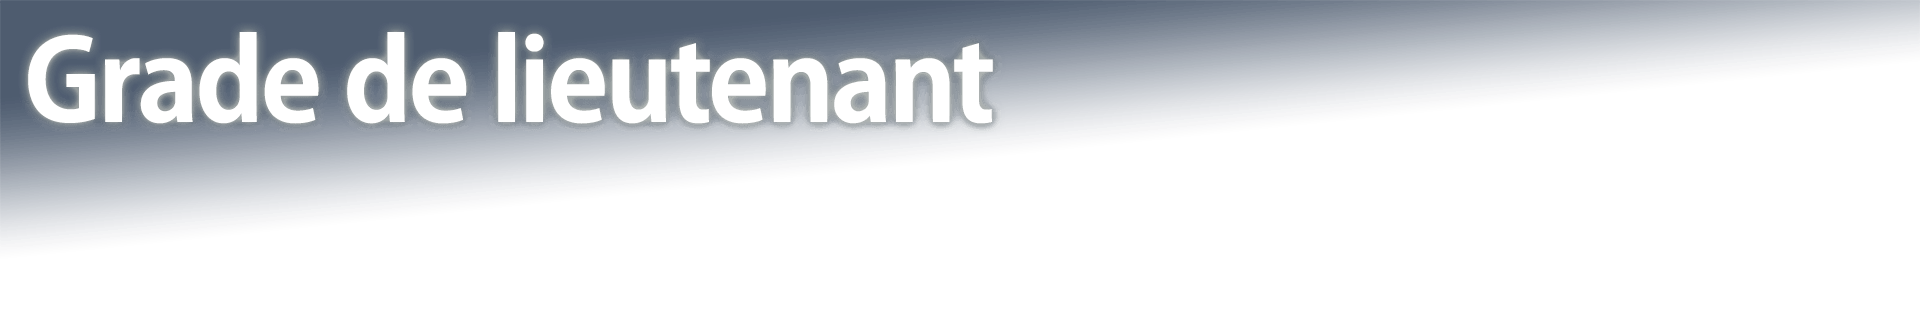 Grade de lieutenant